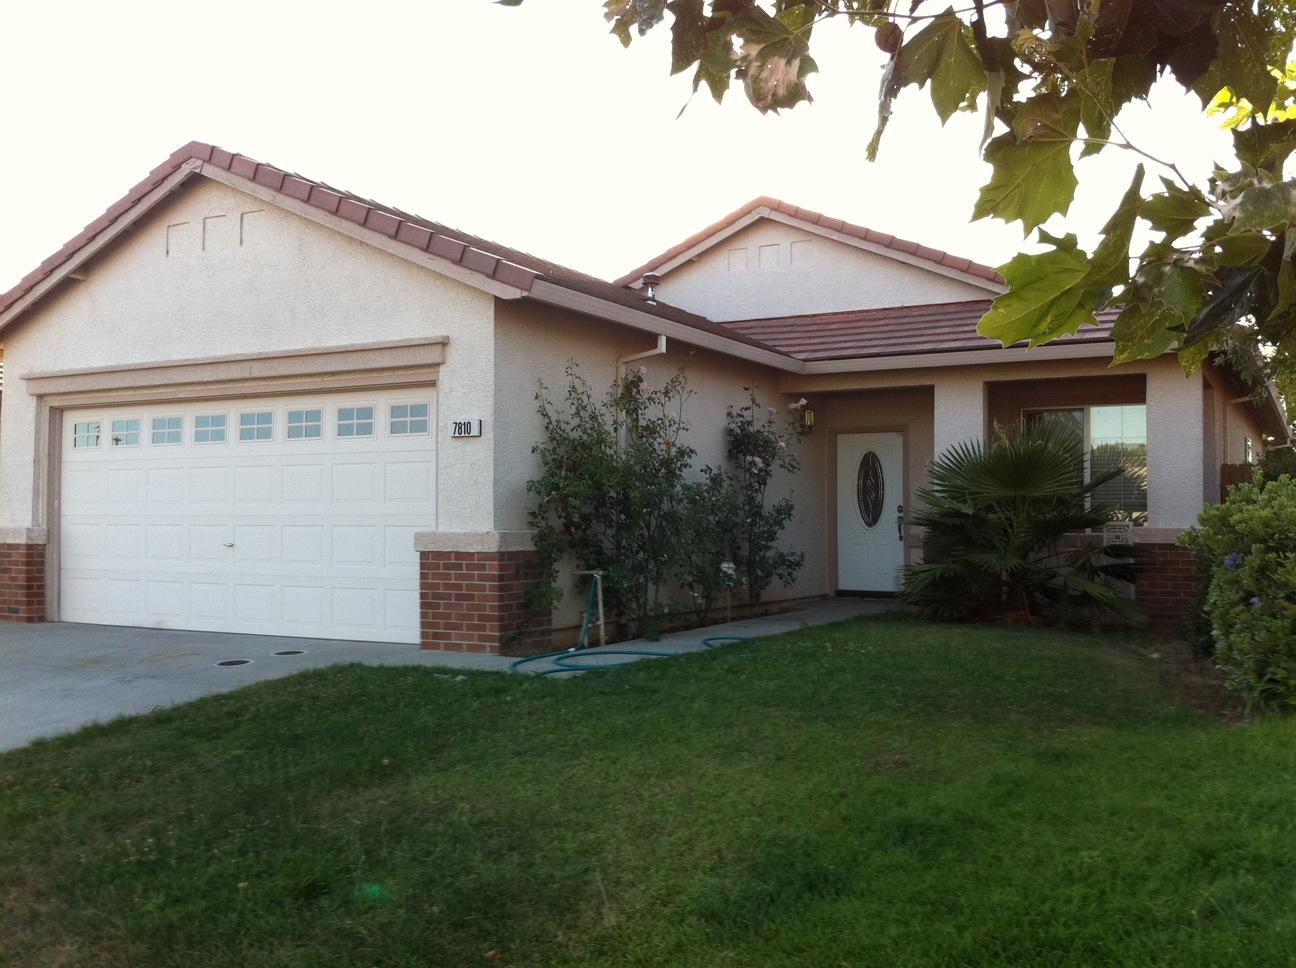 Sacramento Short Sale 95829 U2013 7810 Neyland Way, Sacramento 95829